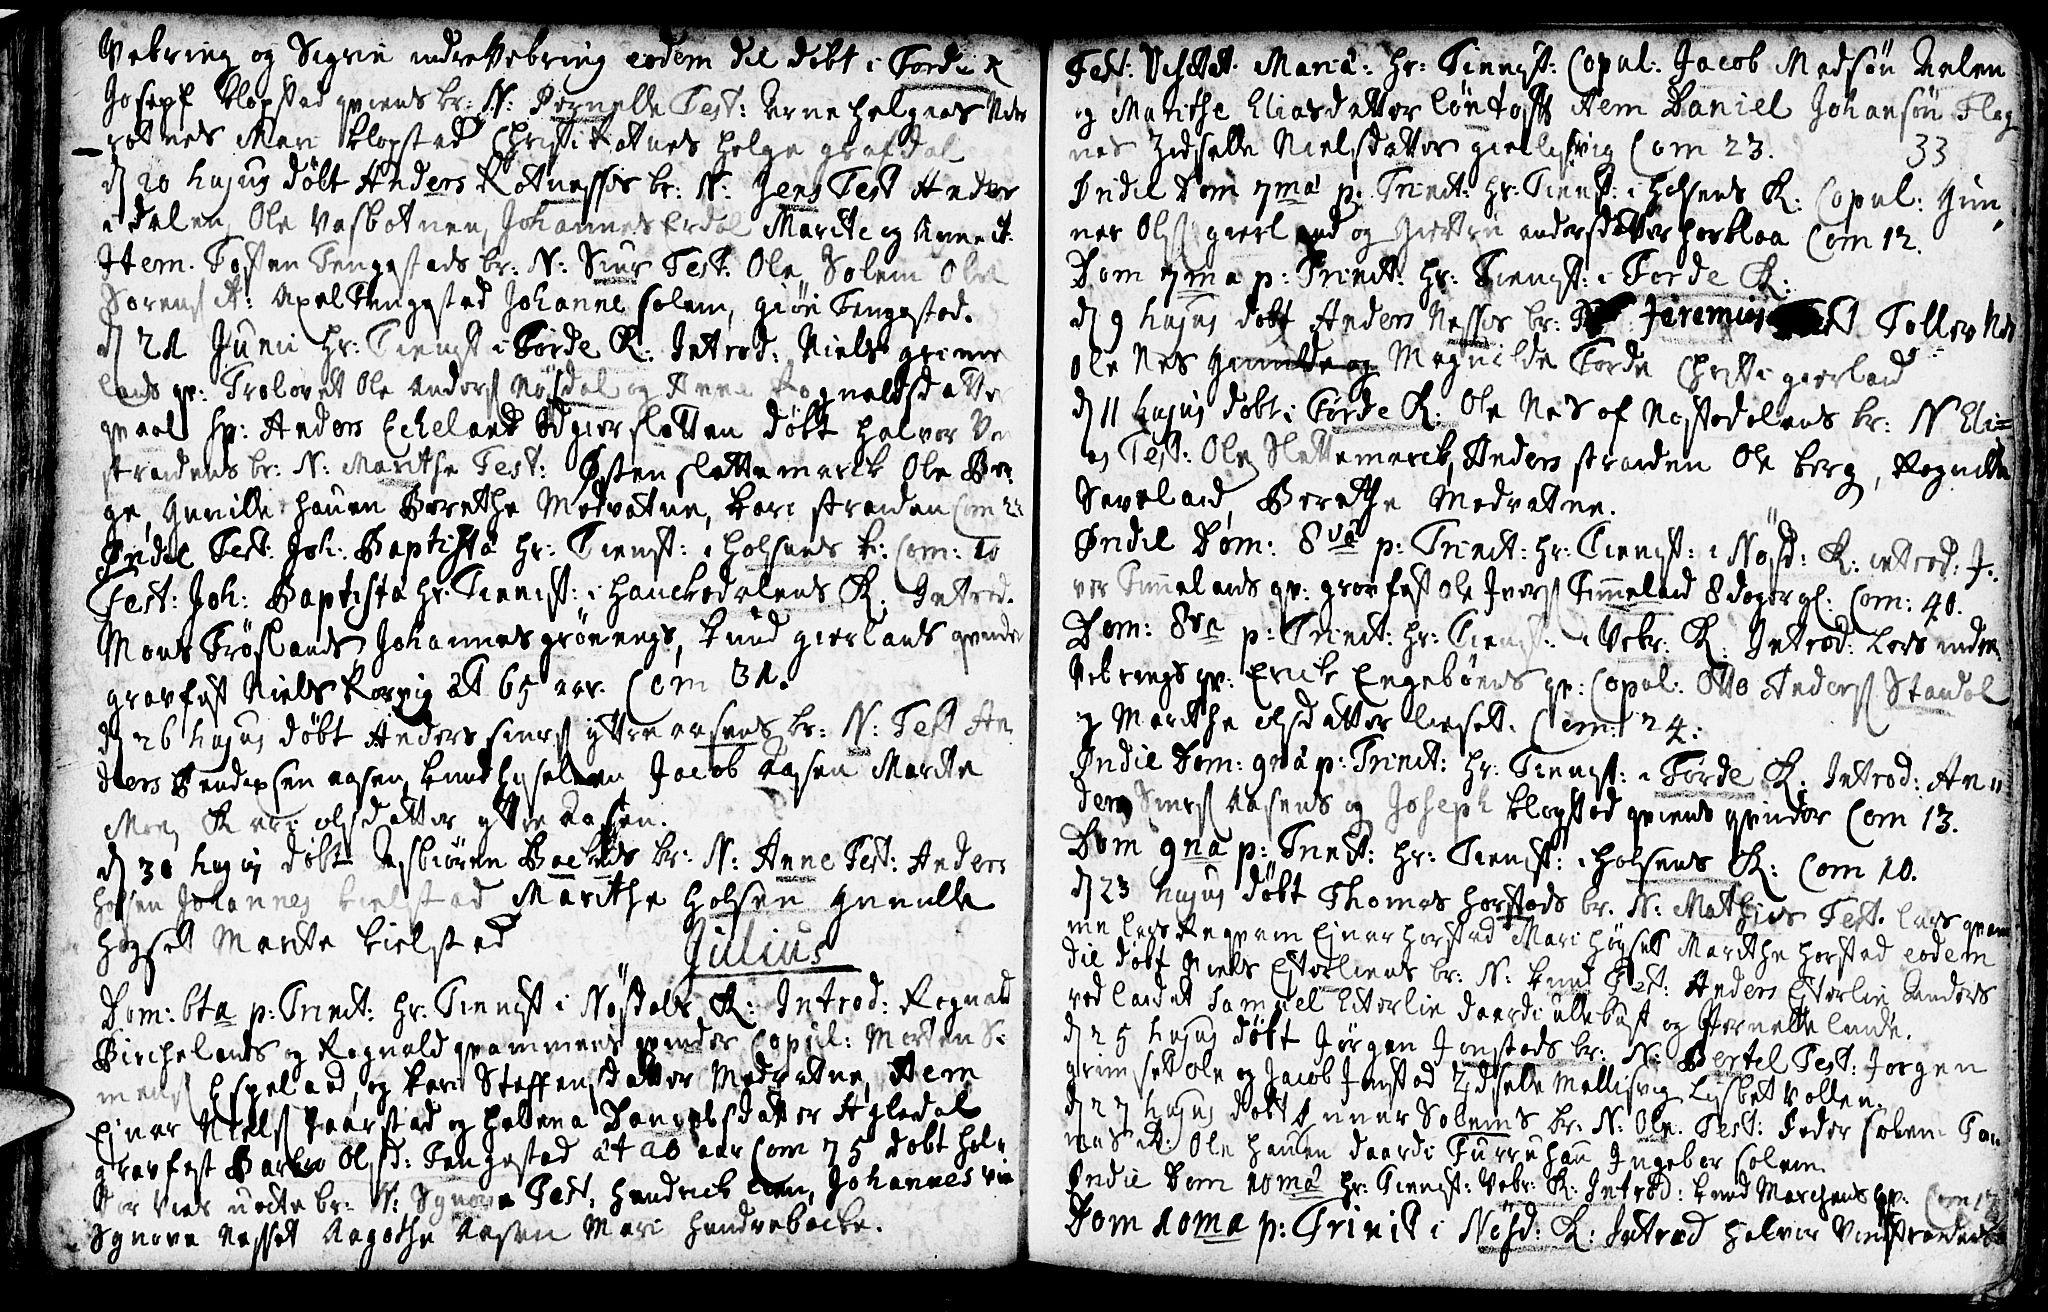 SAB, Førde Sokneprestembete, H/Haa: Ministerialbok nr. A 2, 1728-1748, s. 33